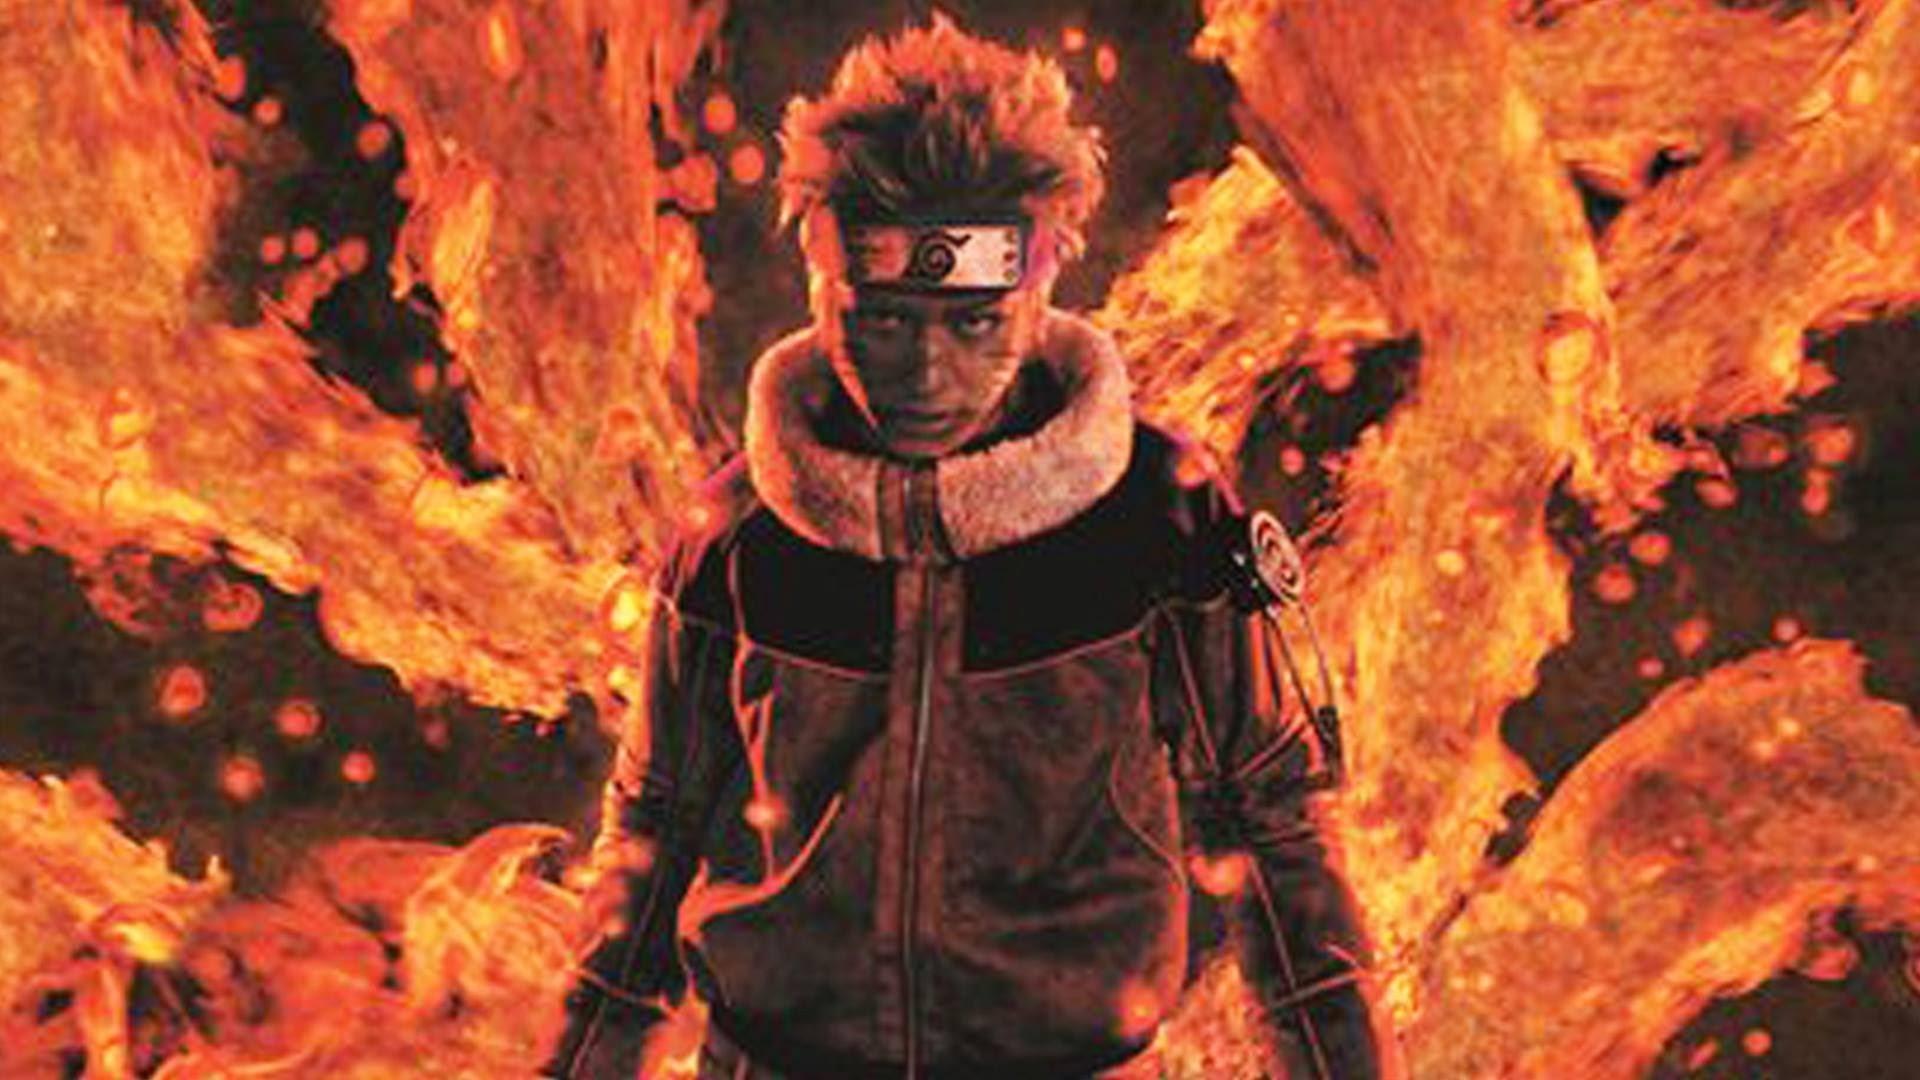 Akatsuki Hd Live Wallpaper Wallpapers Of Naruto Characters 57 Images